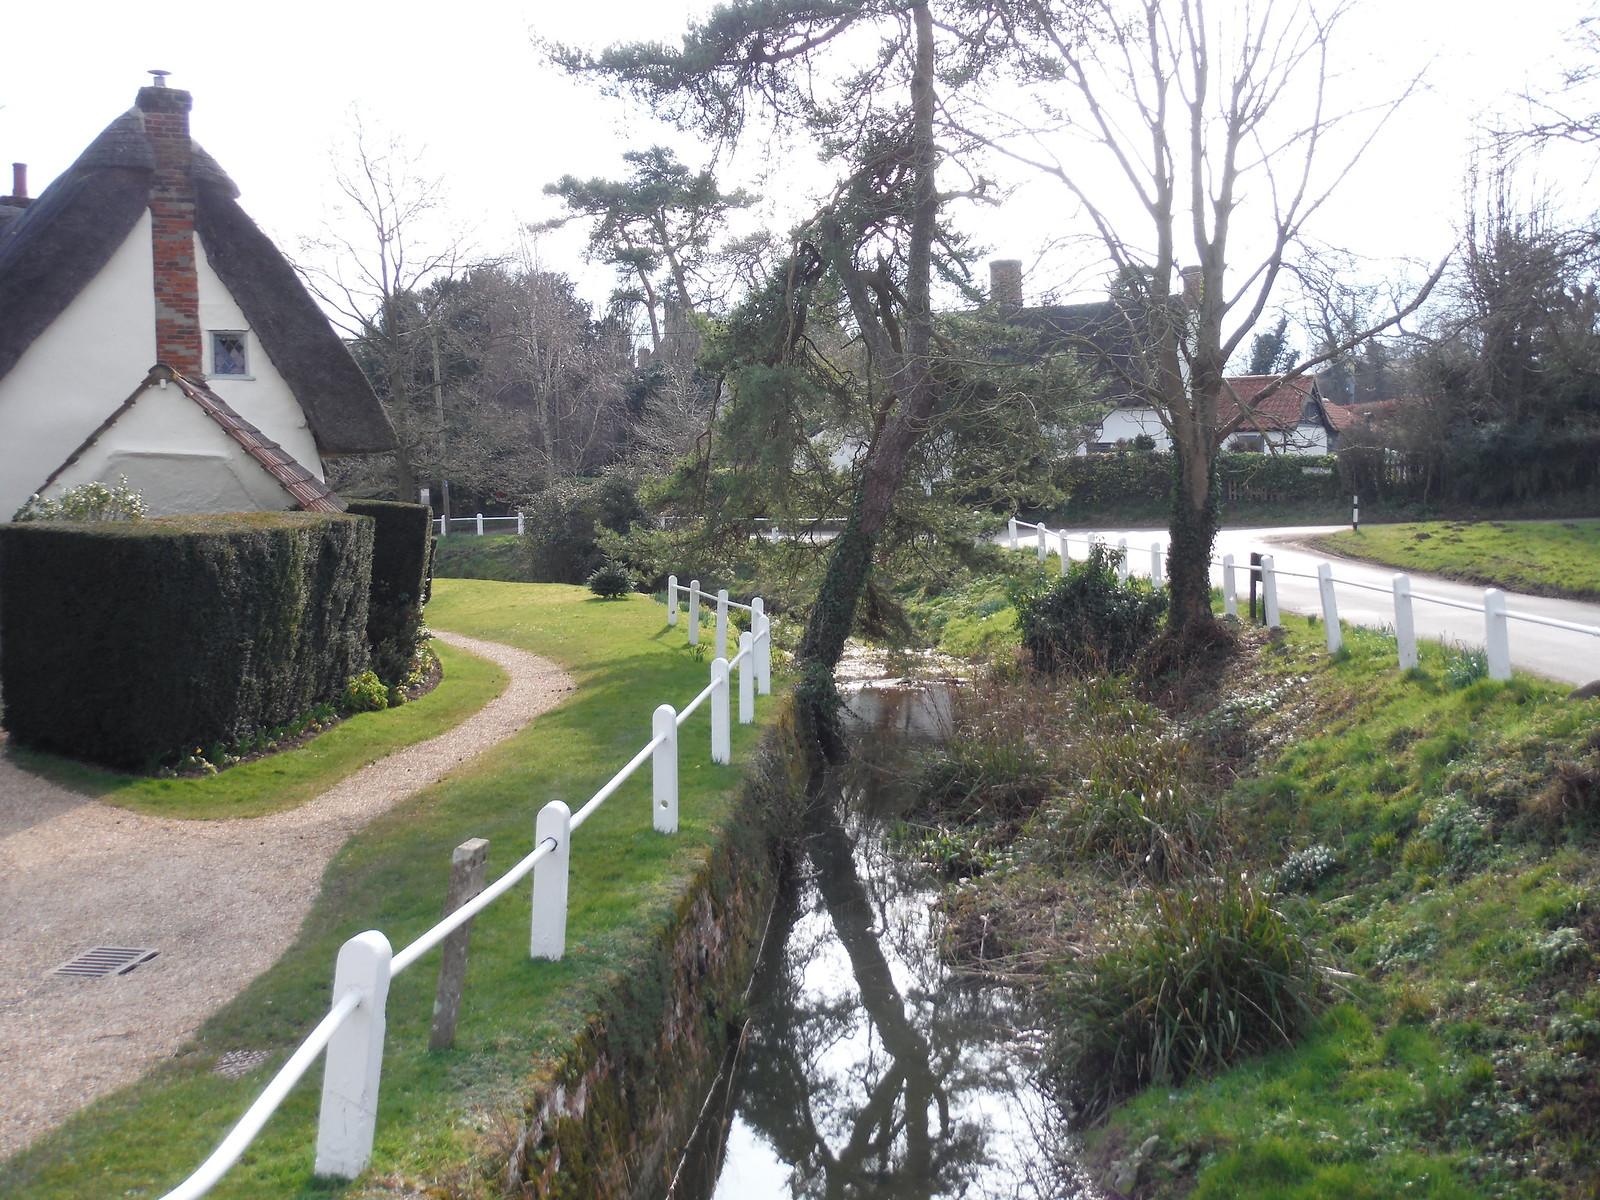 Wicken Water, Arkesden SWC Walk 116 Wendens Ambo [Audley End station] Circular